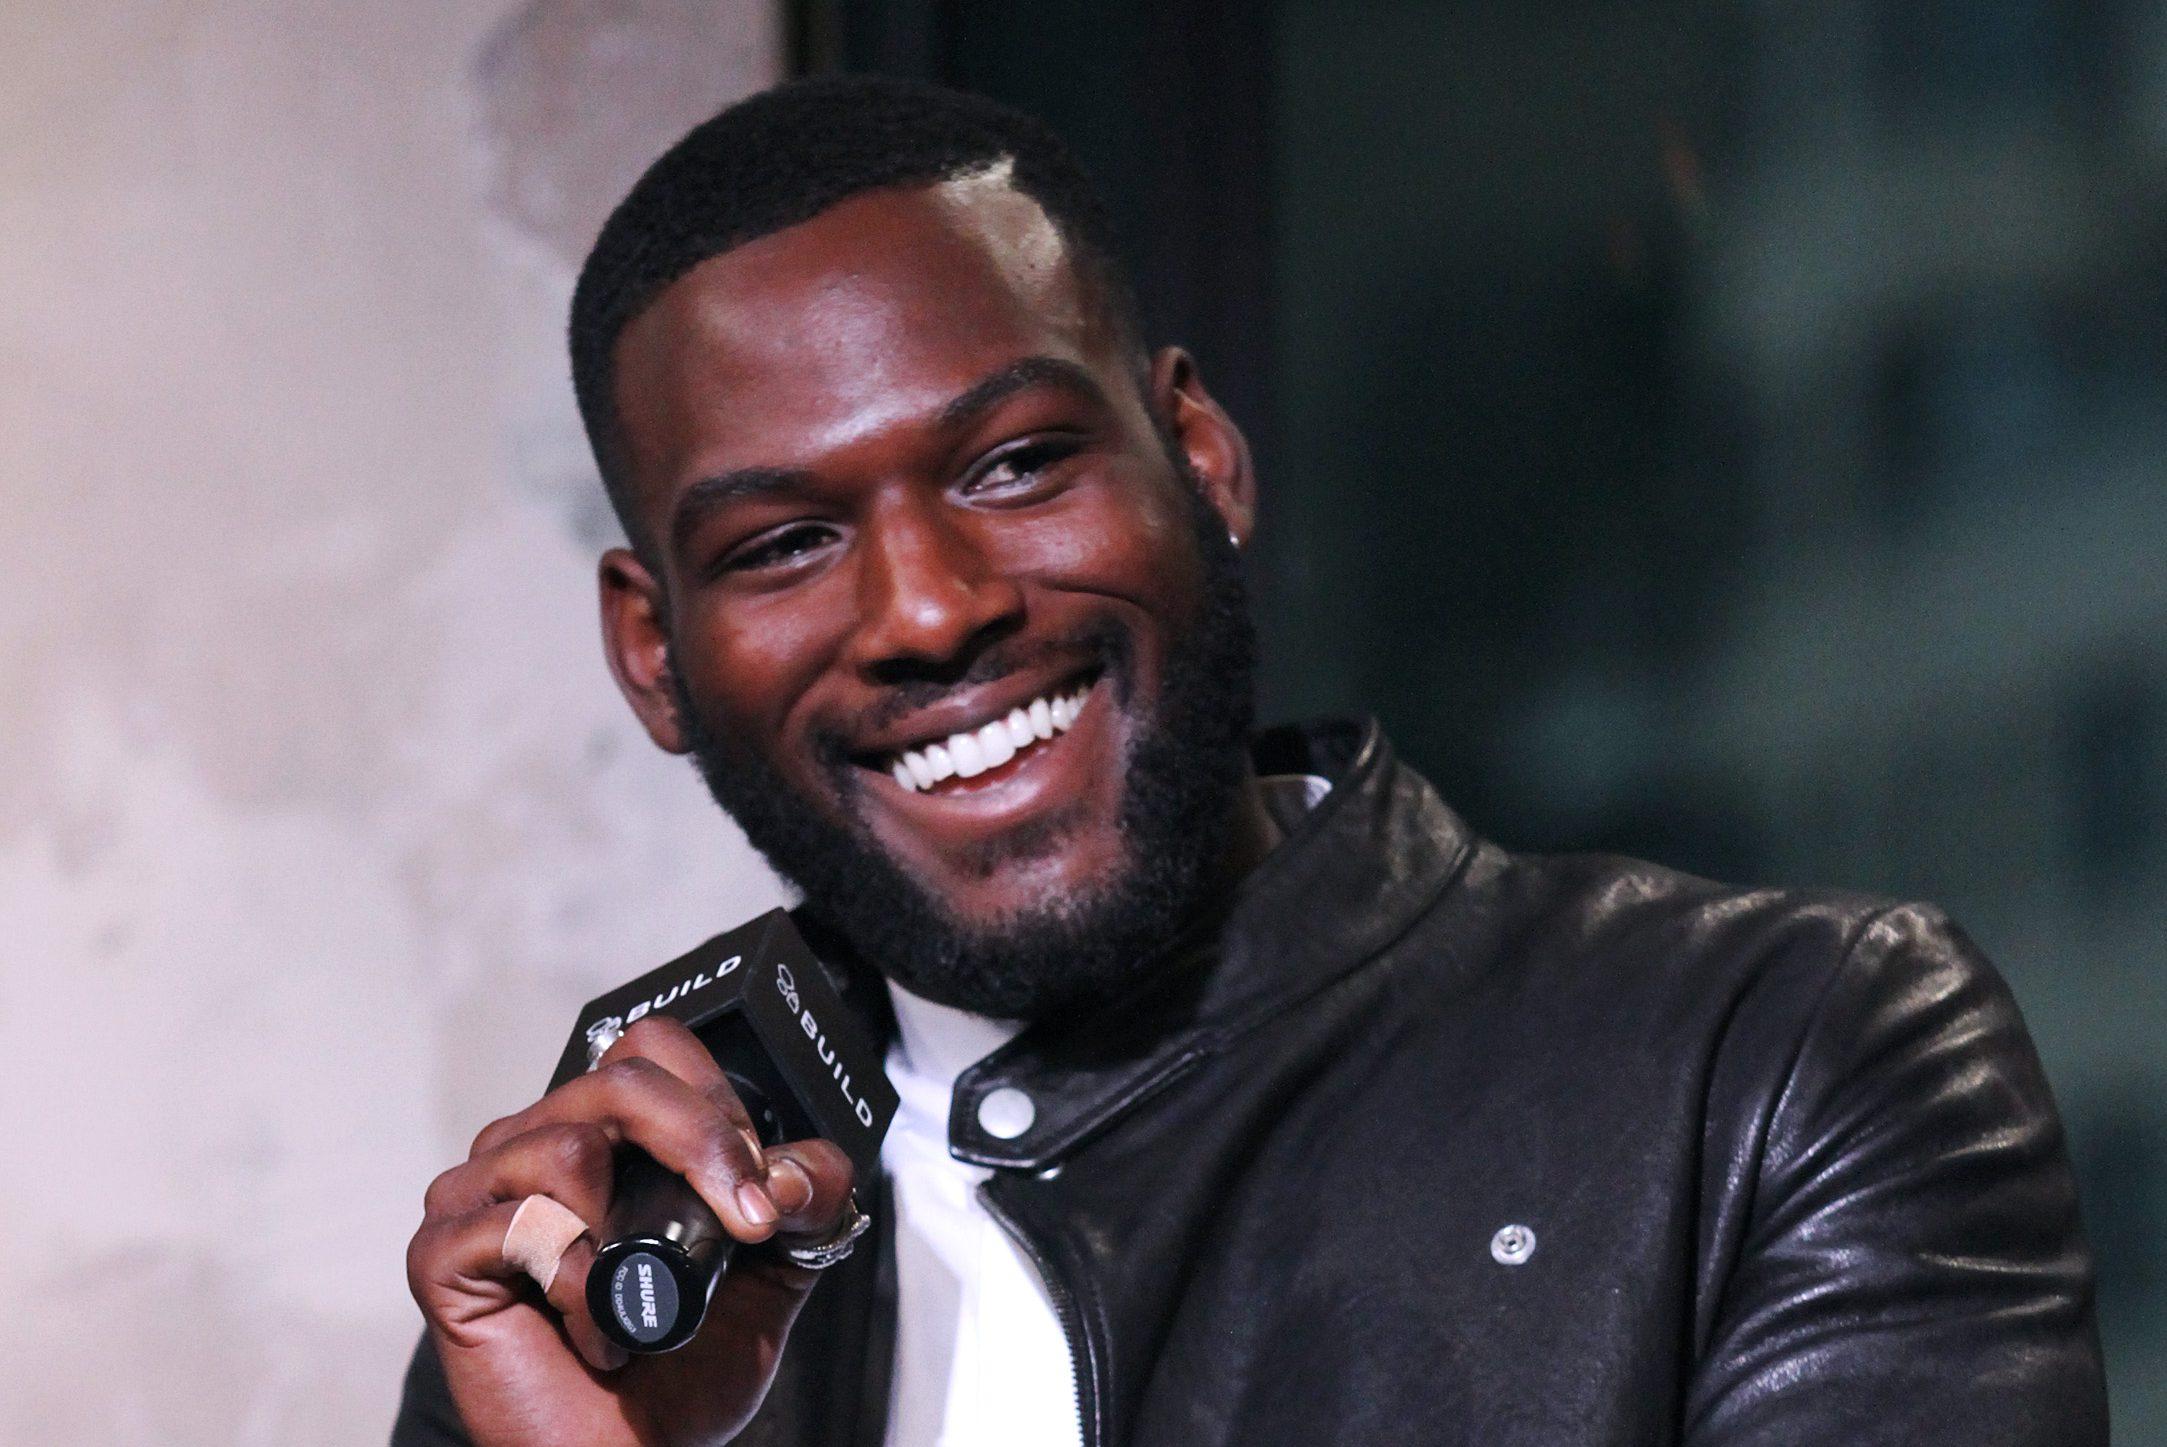 Sexy black male celebrity